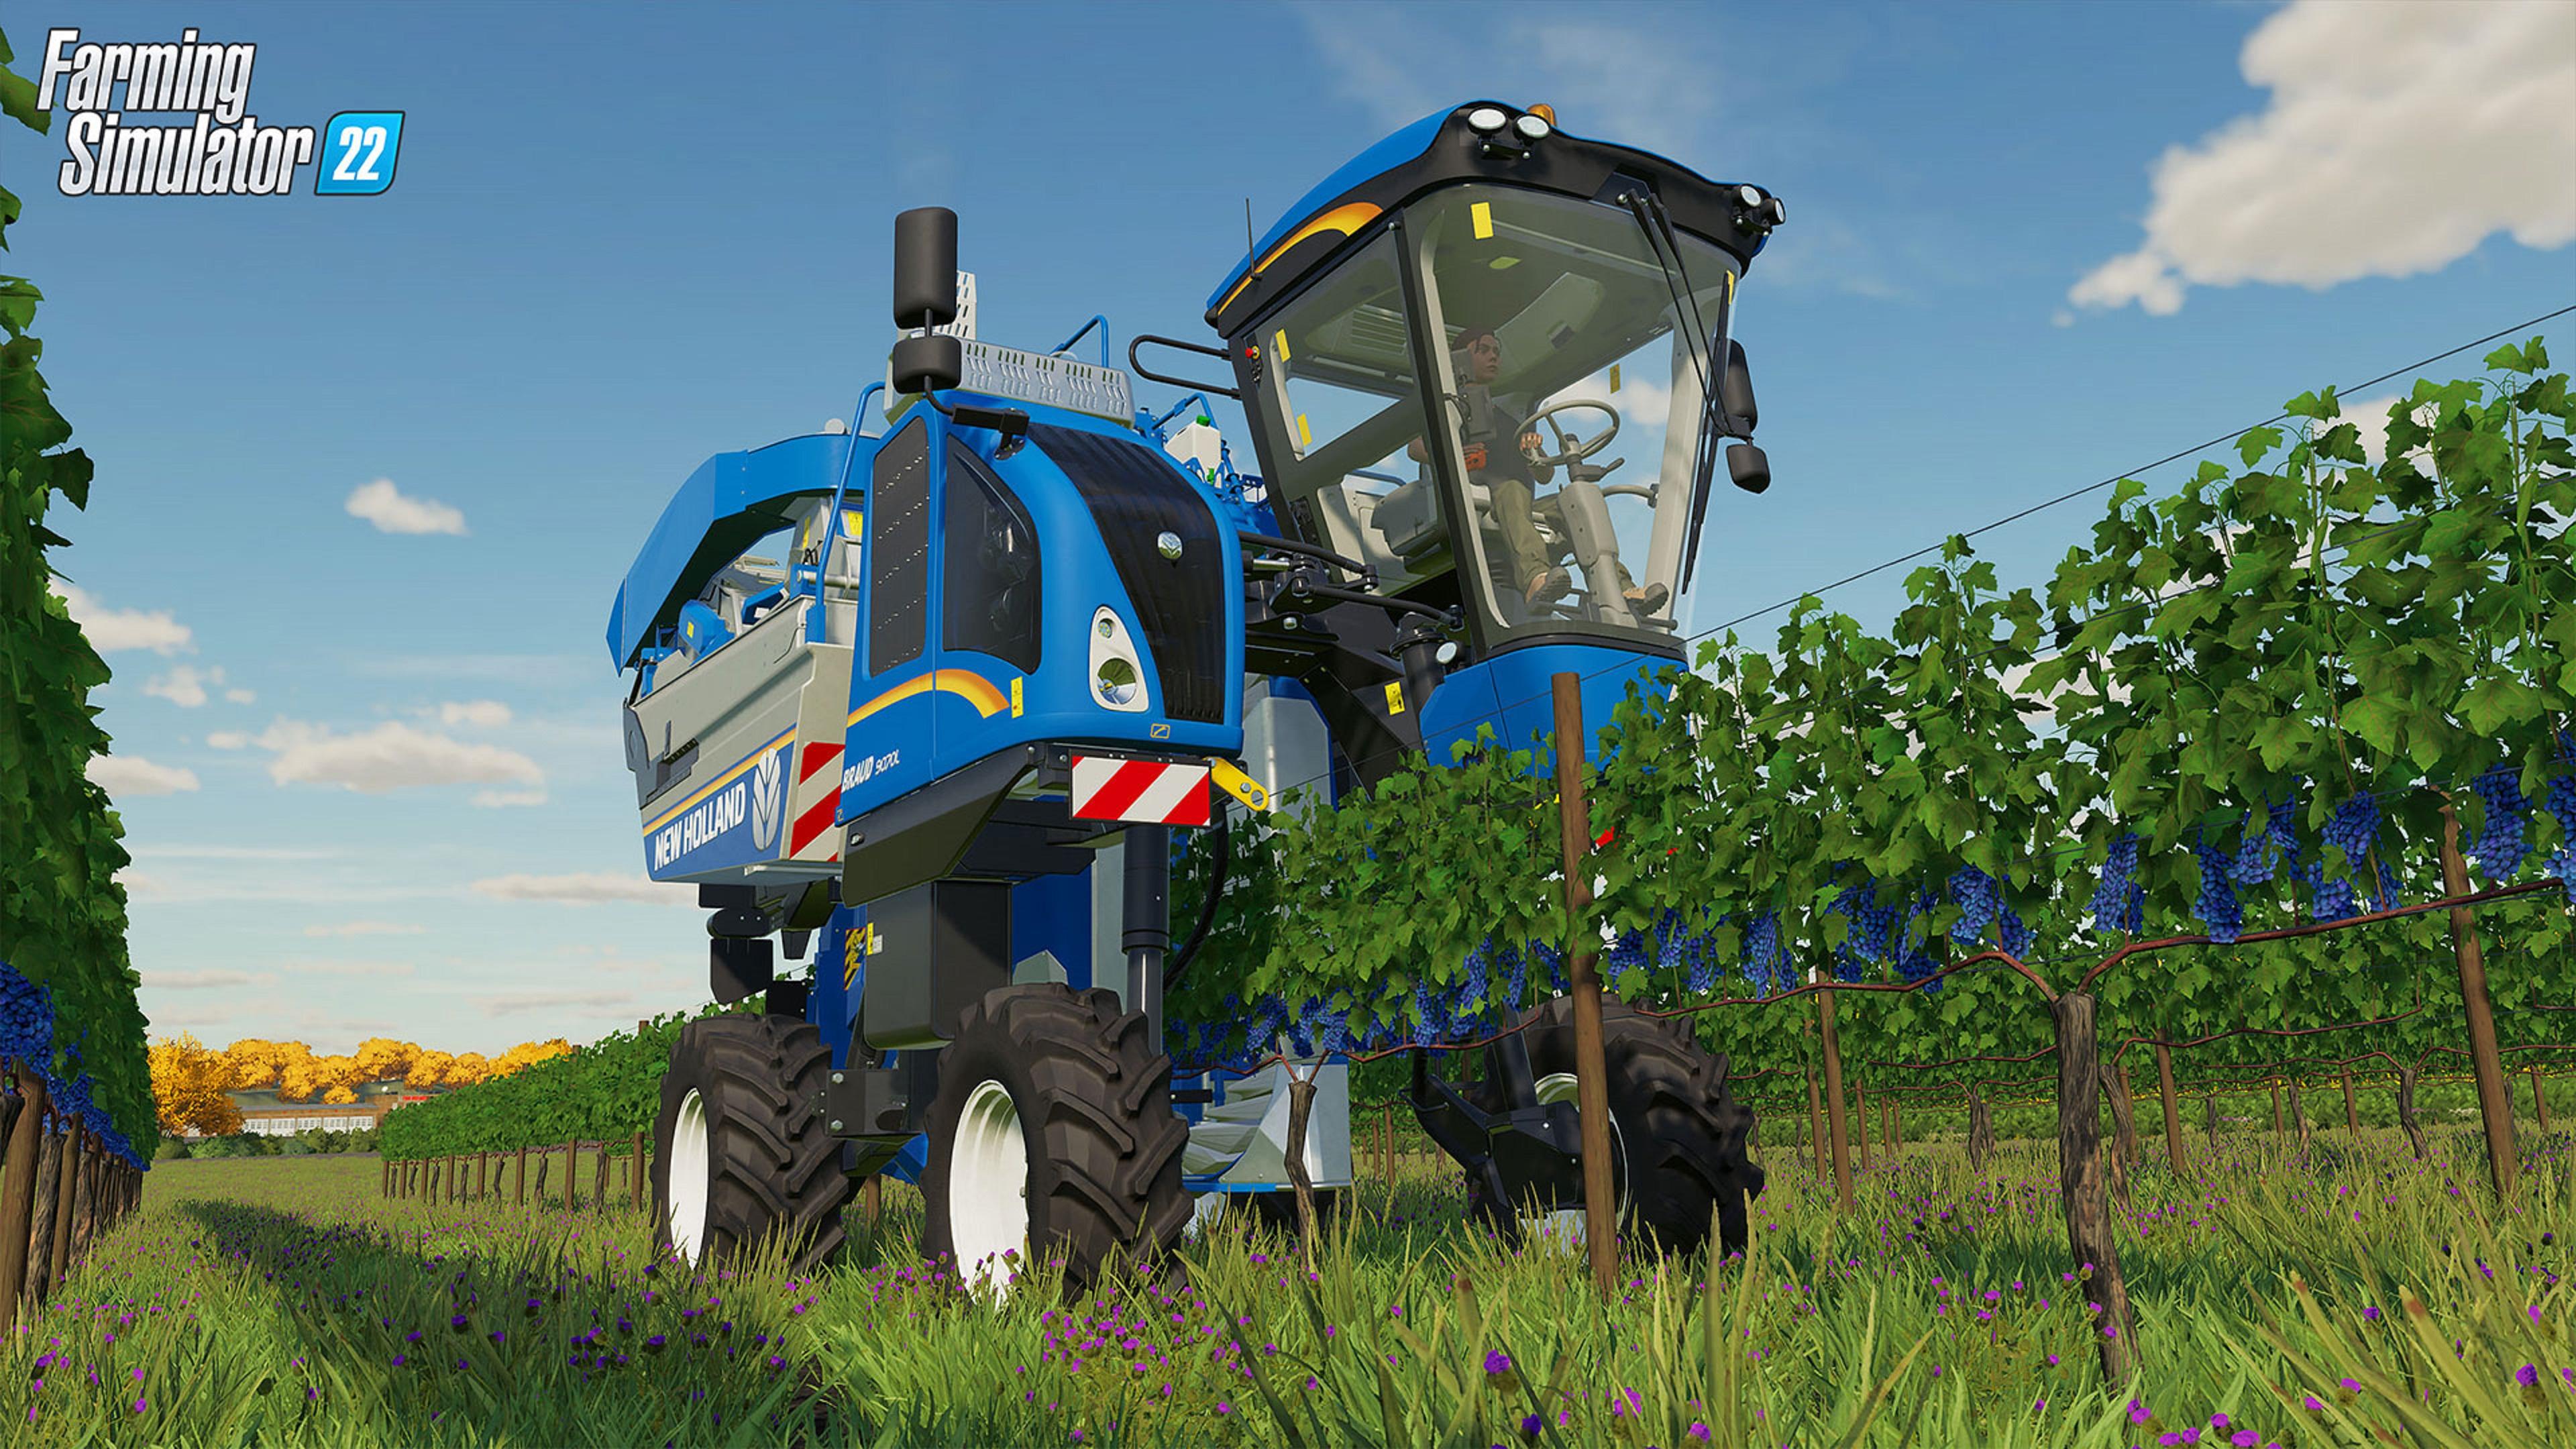 Скриншот №1 к Farming Simulator 22 PS4 and PS5